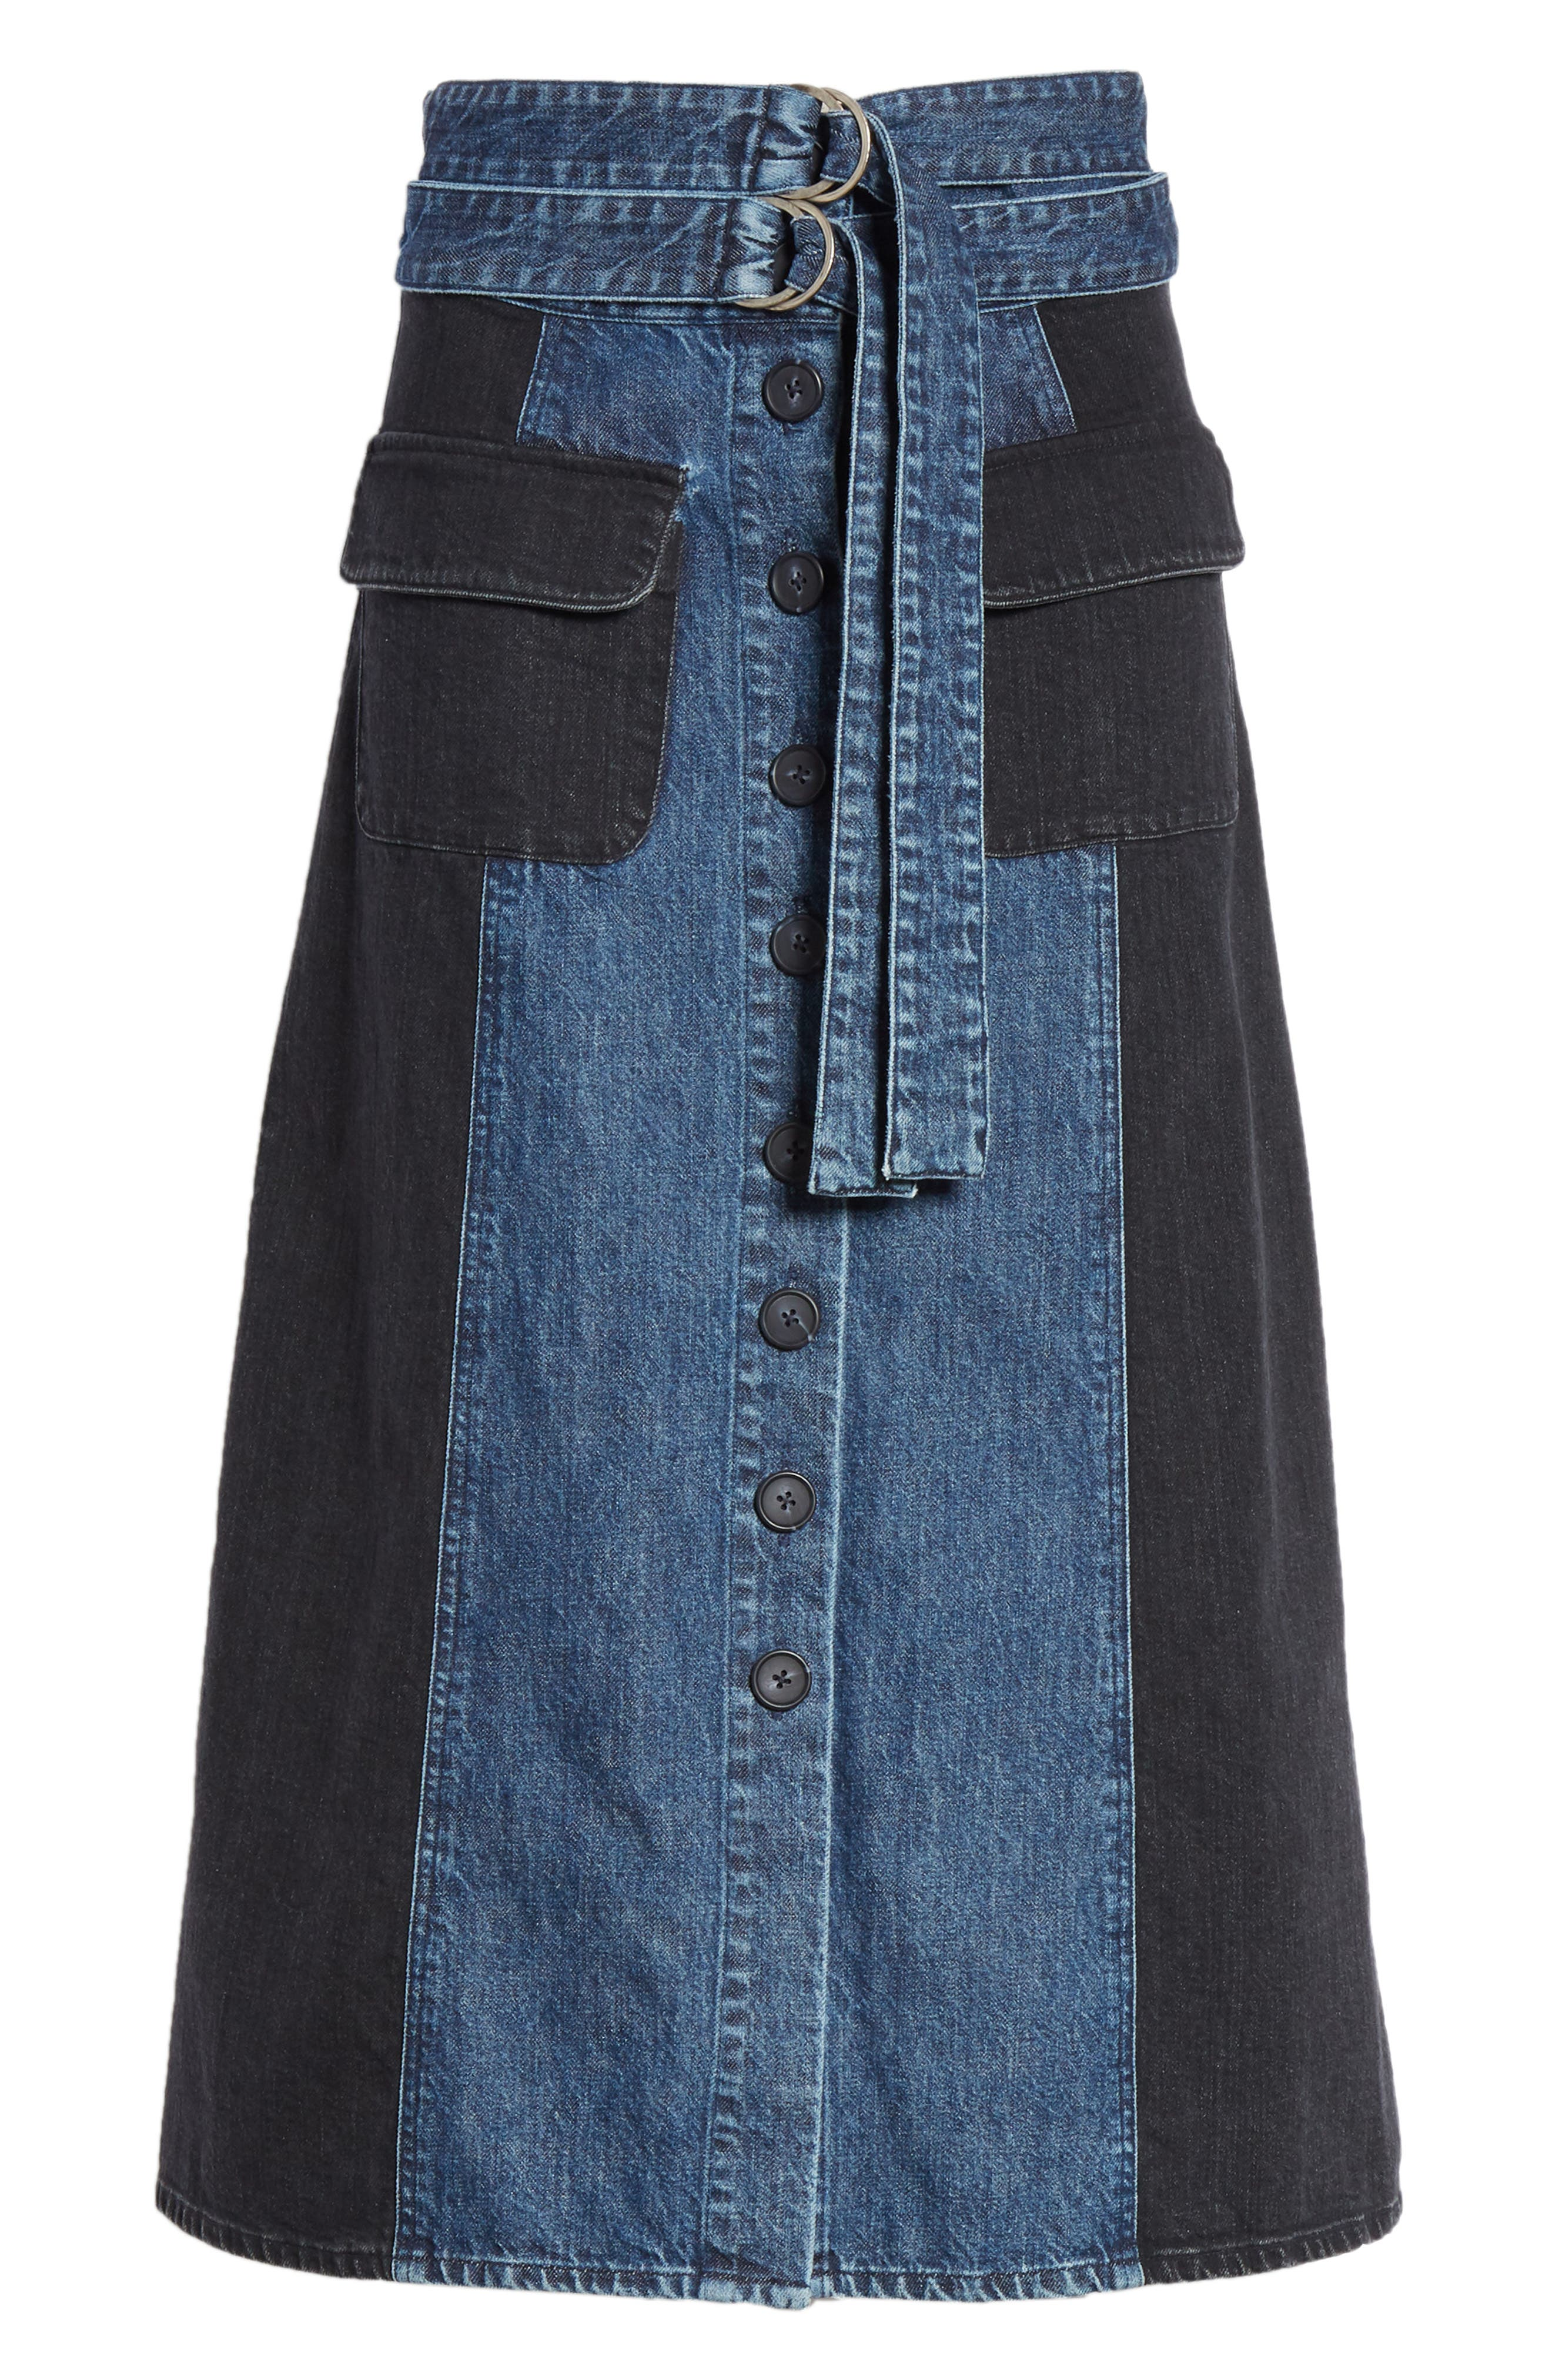 Bleu Bicolor Denim Midi Skirt,                             Alternate thumbnail 6, color,                             INDIGO/ BLACK